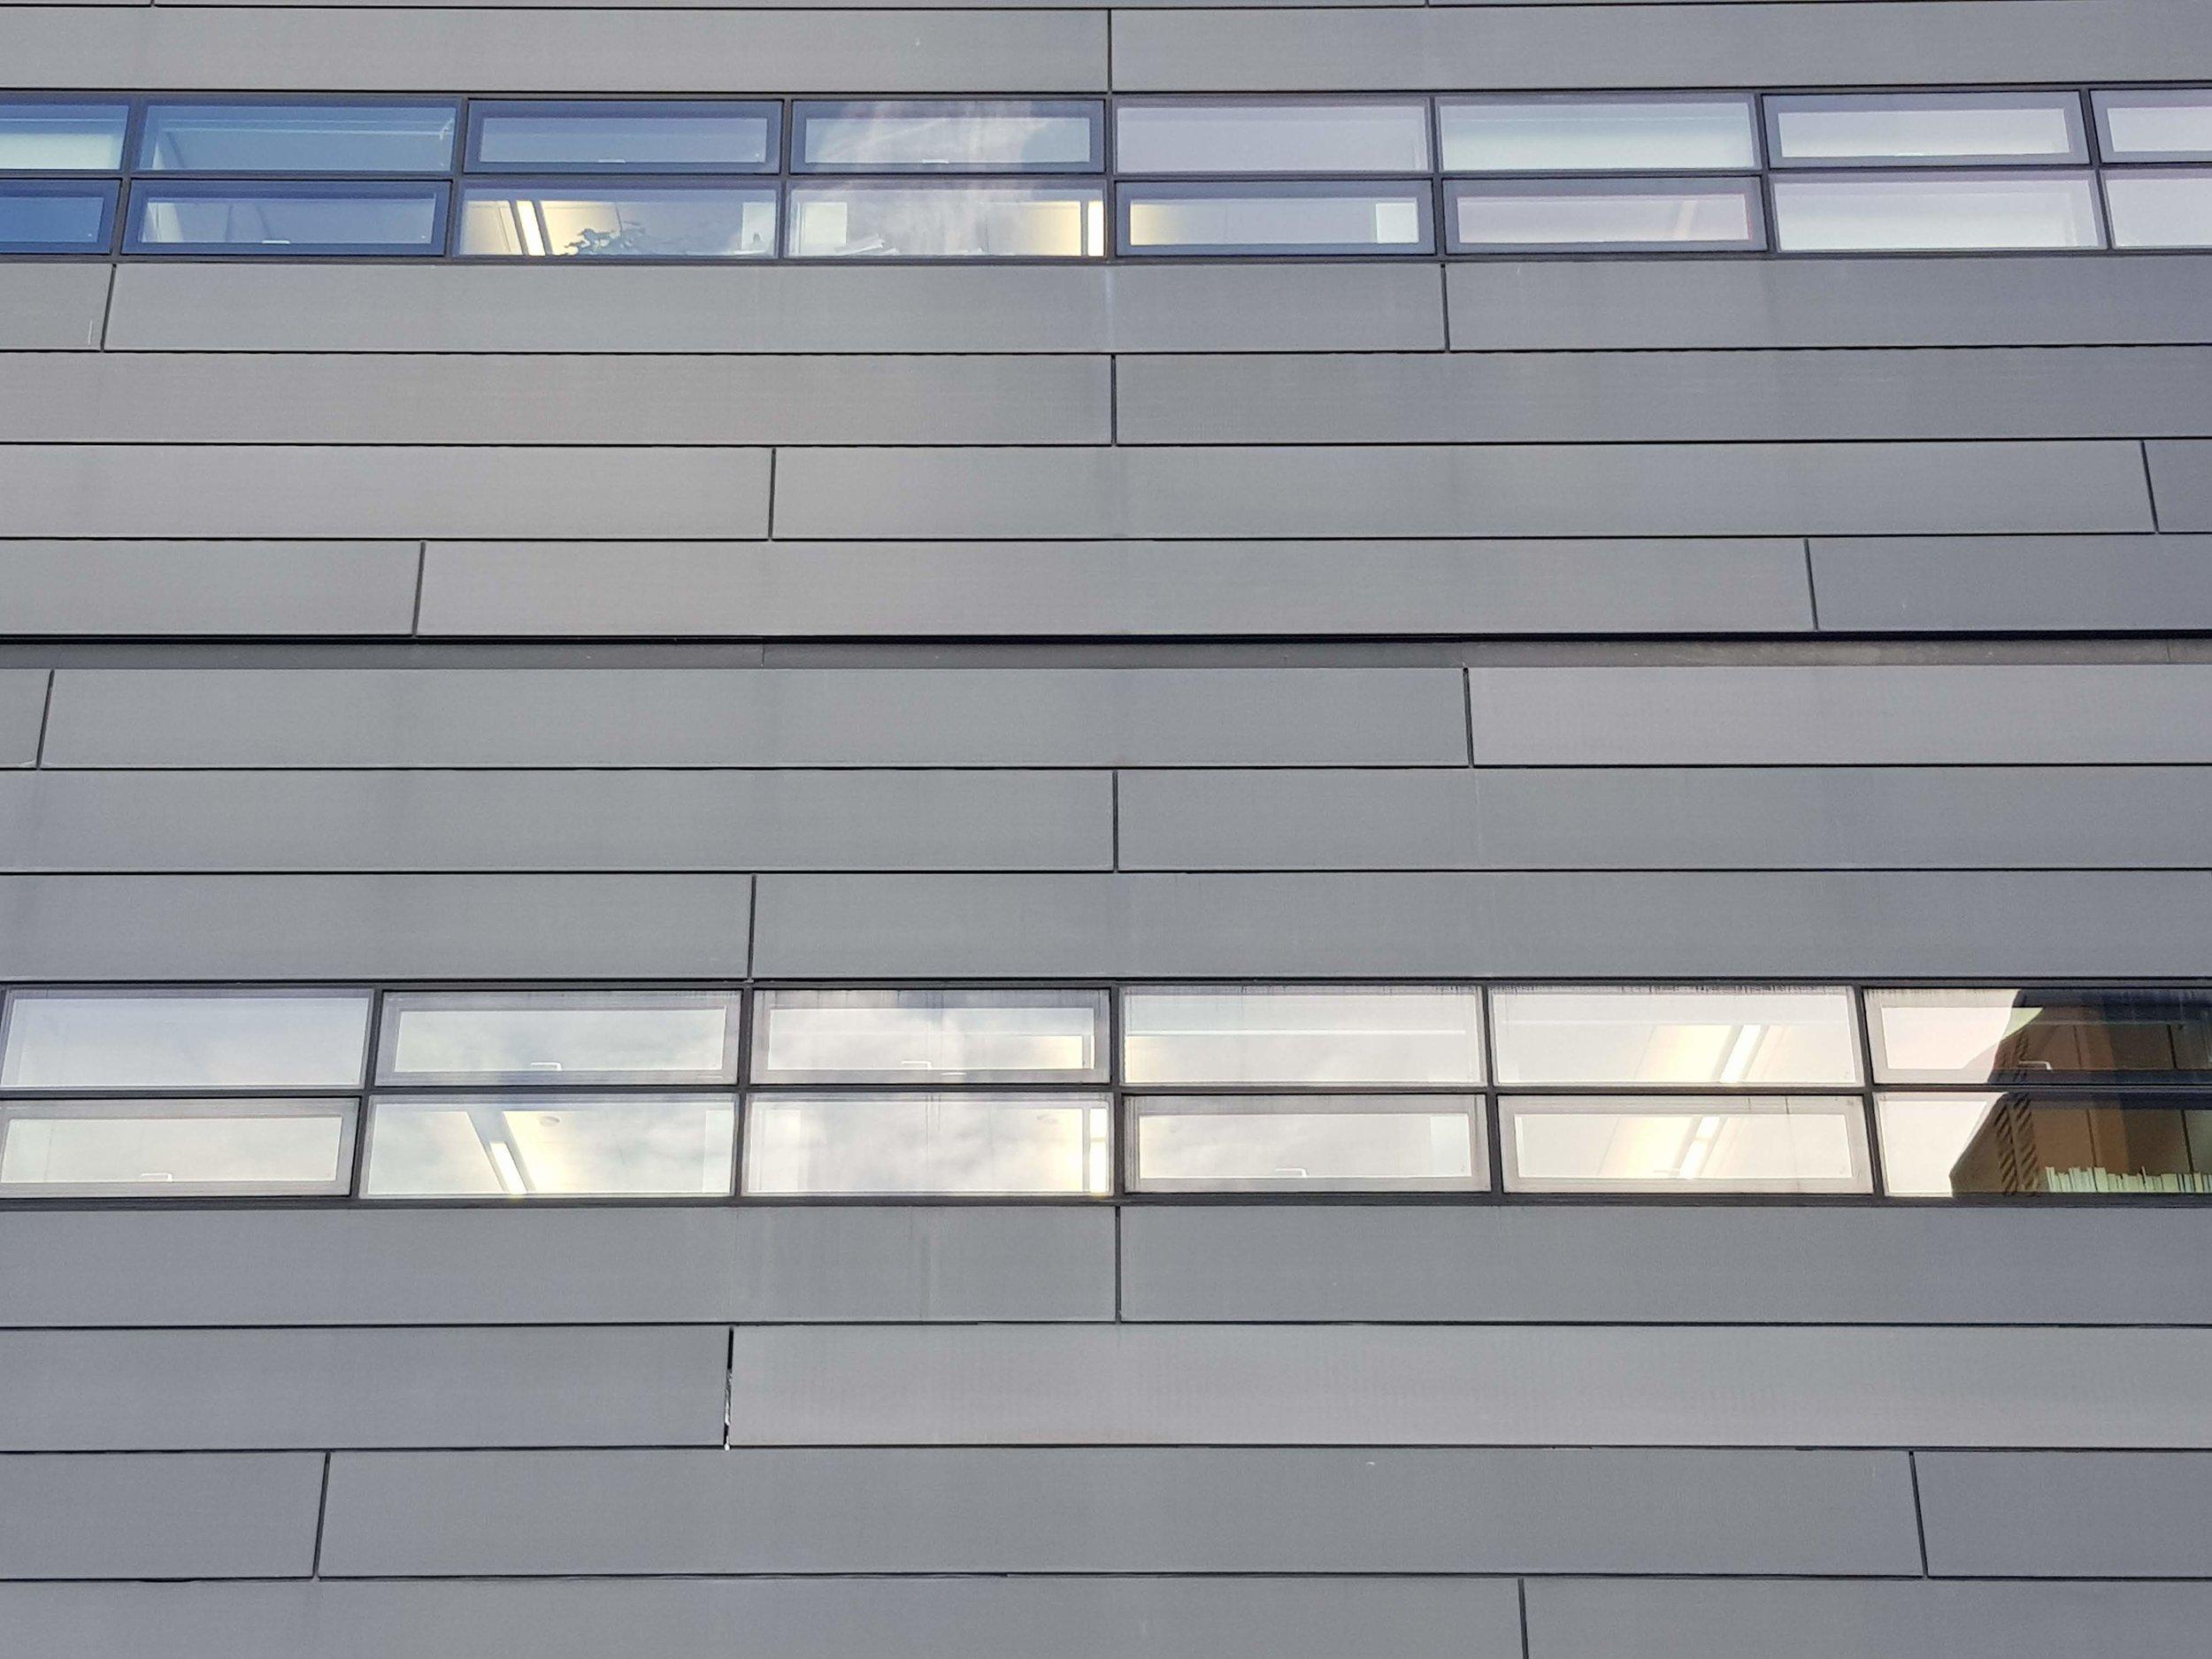 120 turing building 20181114_135012.jpg